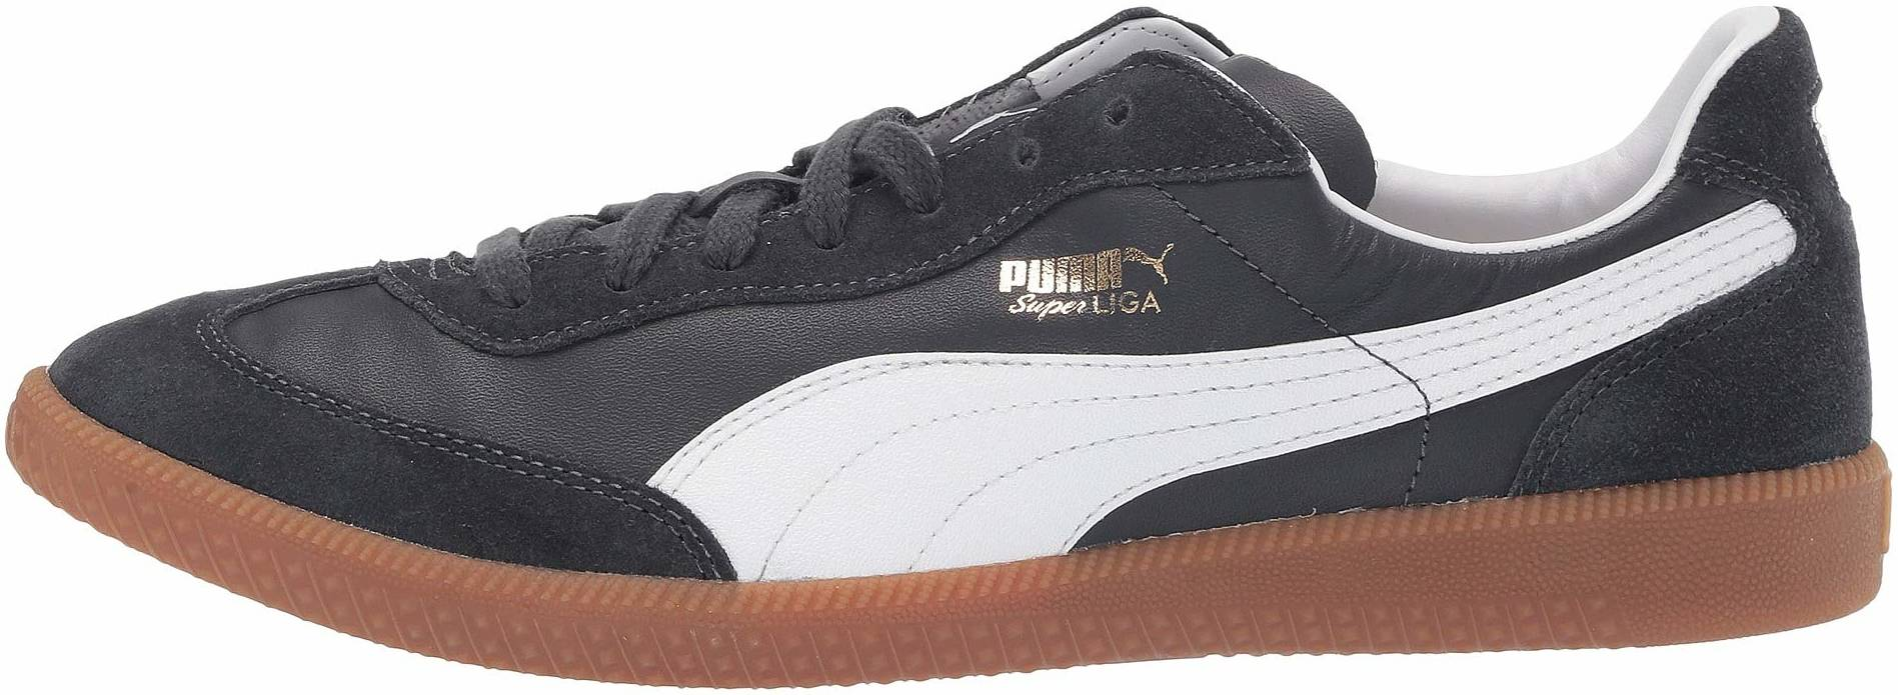 Puma Super Liga OG Retro sneakers in blue white | RunRepeat